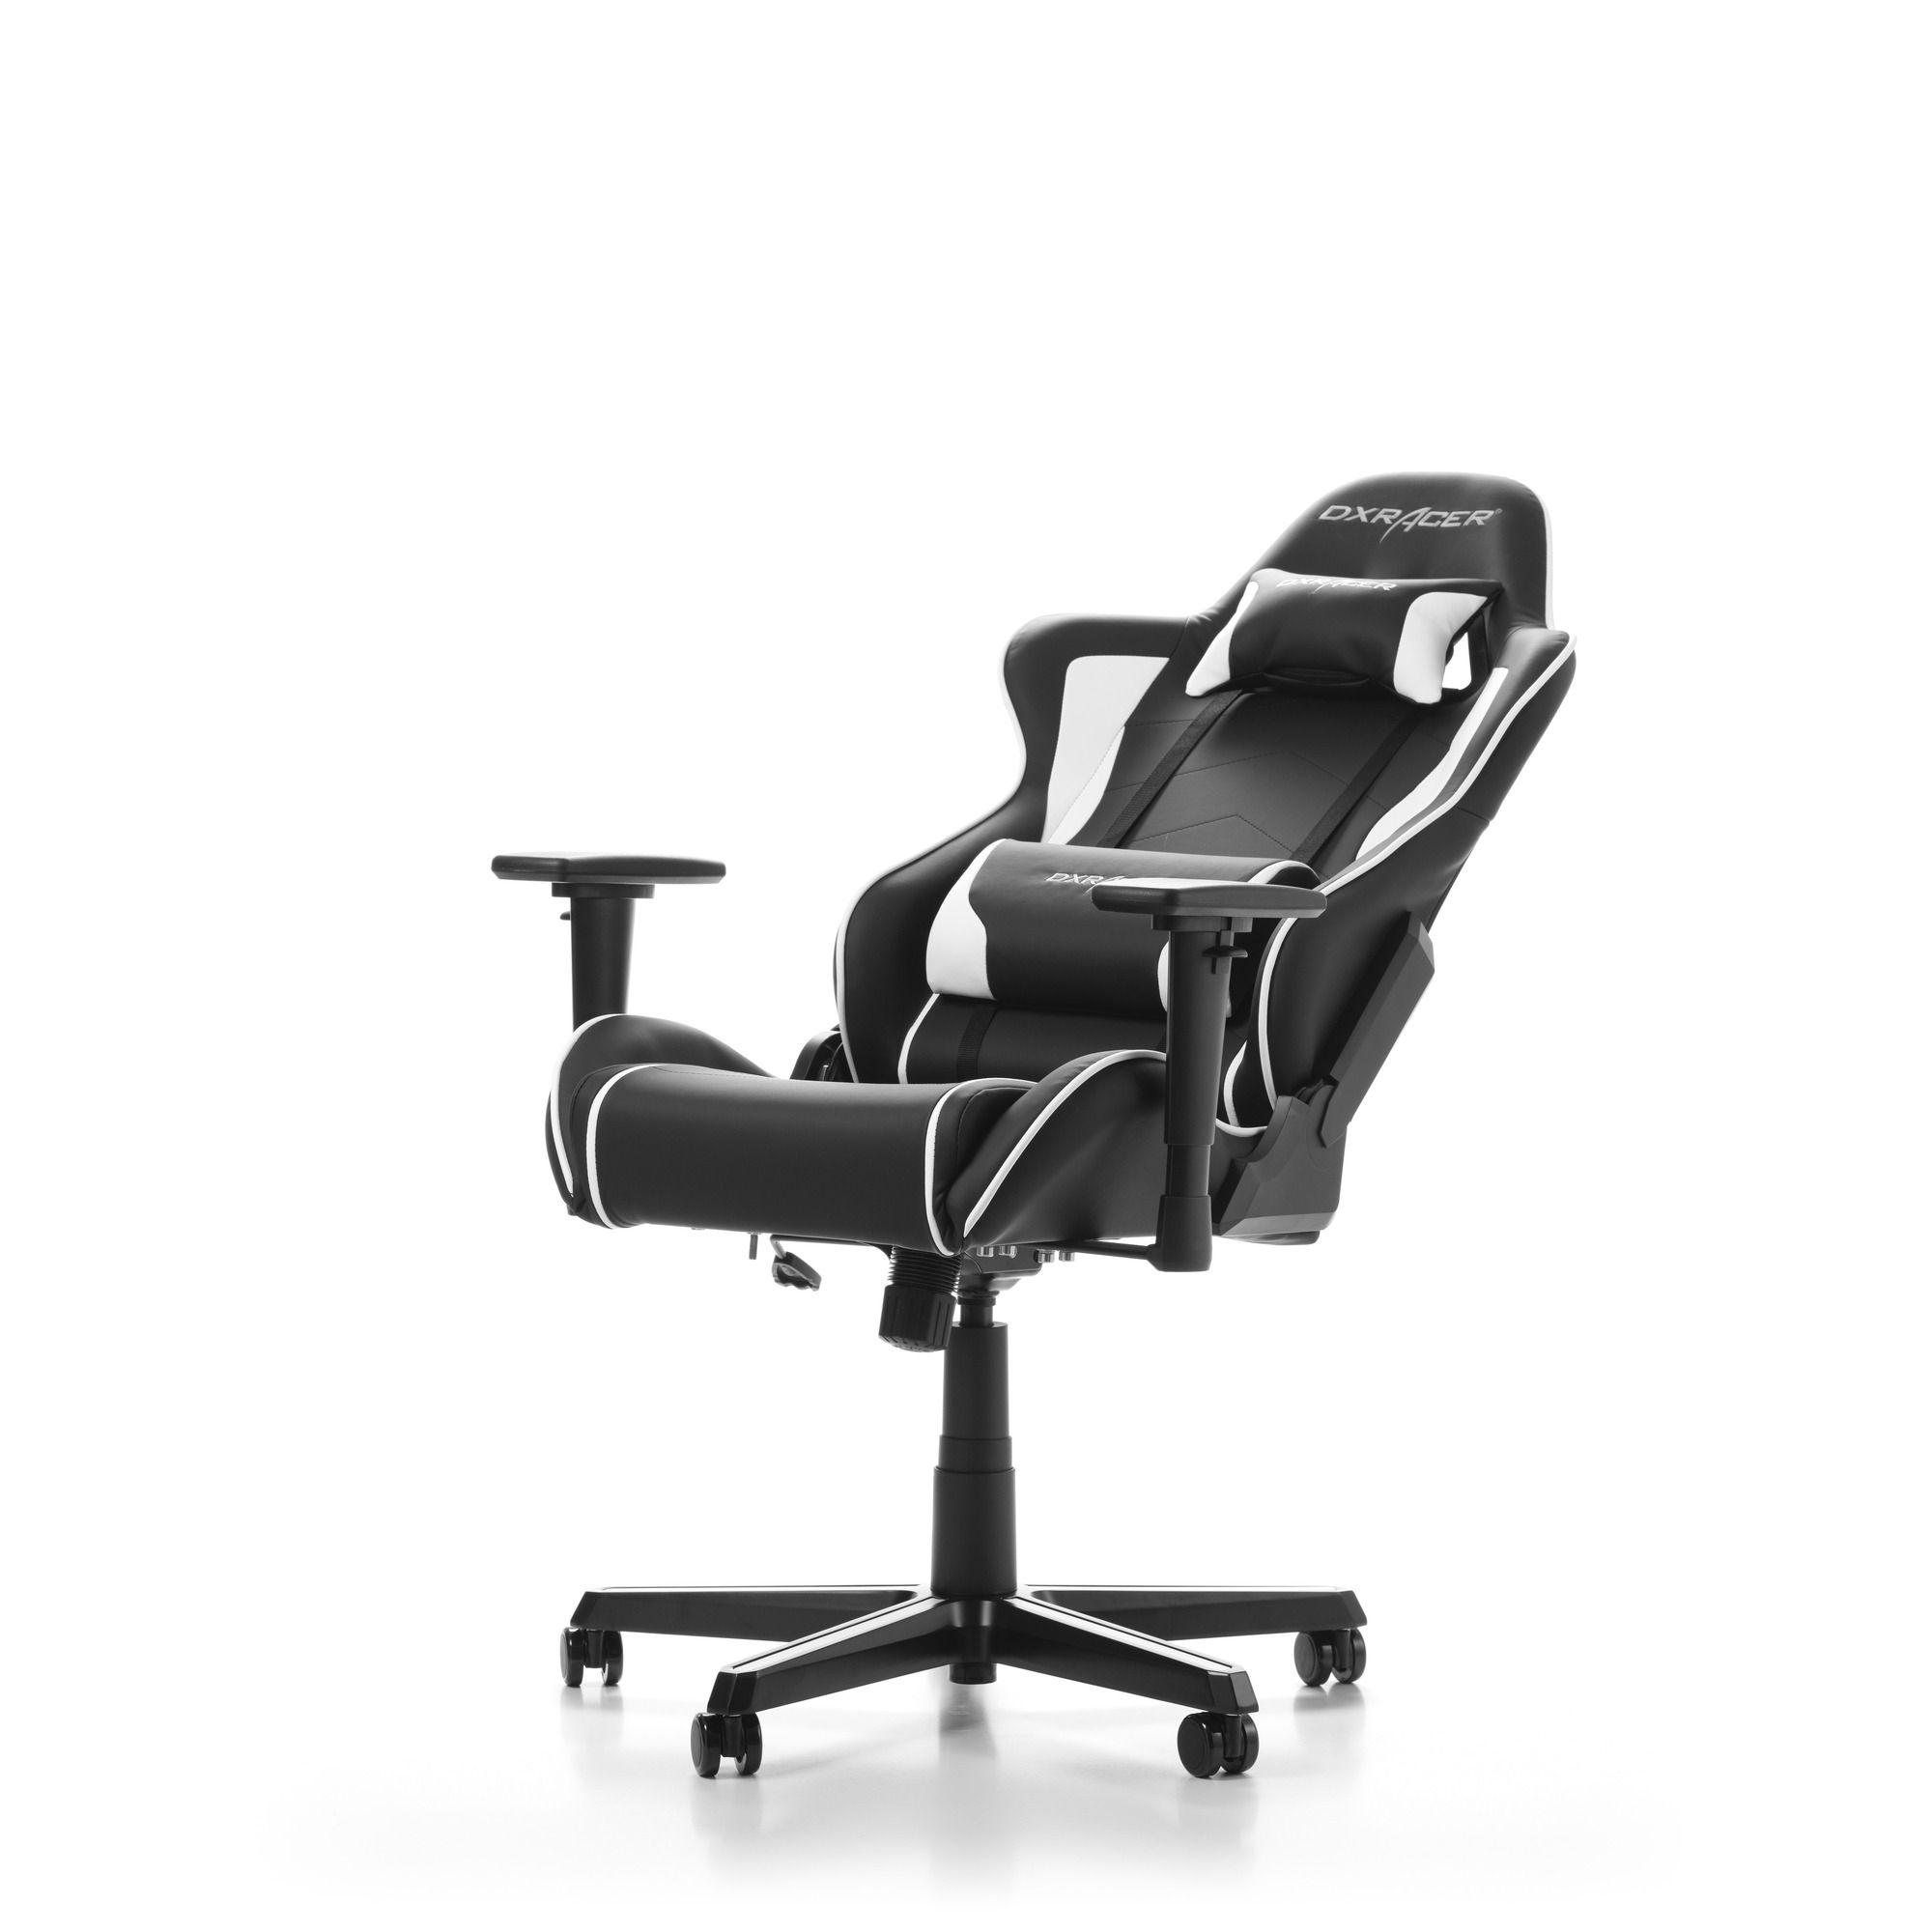 Гейминг стол DXRacer OH/FH08/NW - серия FORMULA, черен/бял - 2